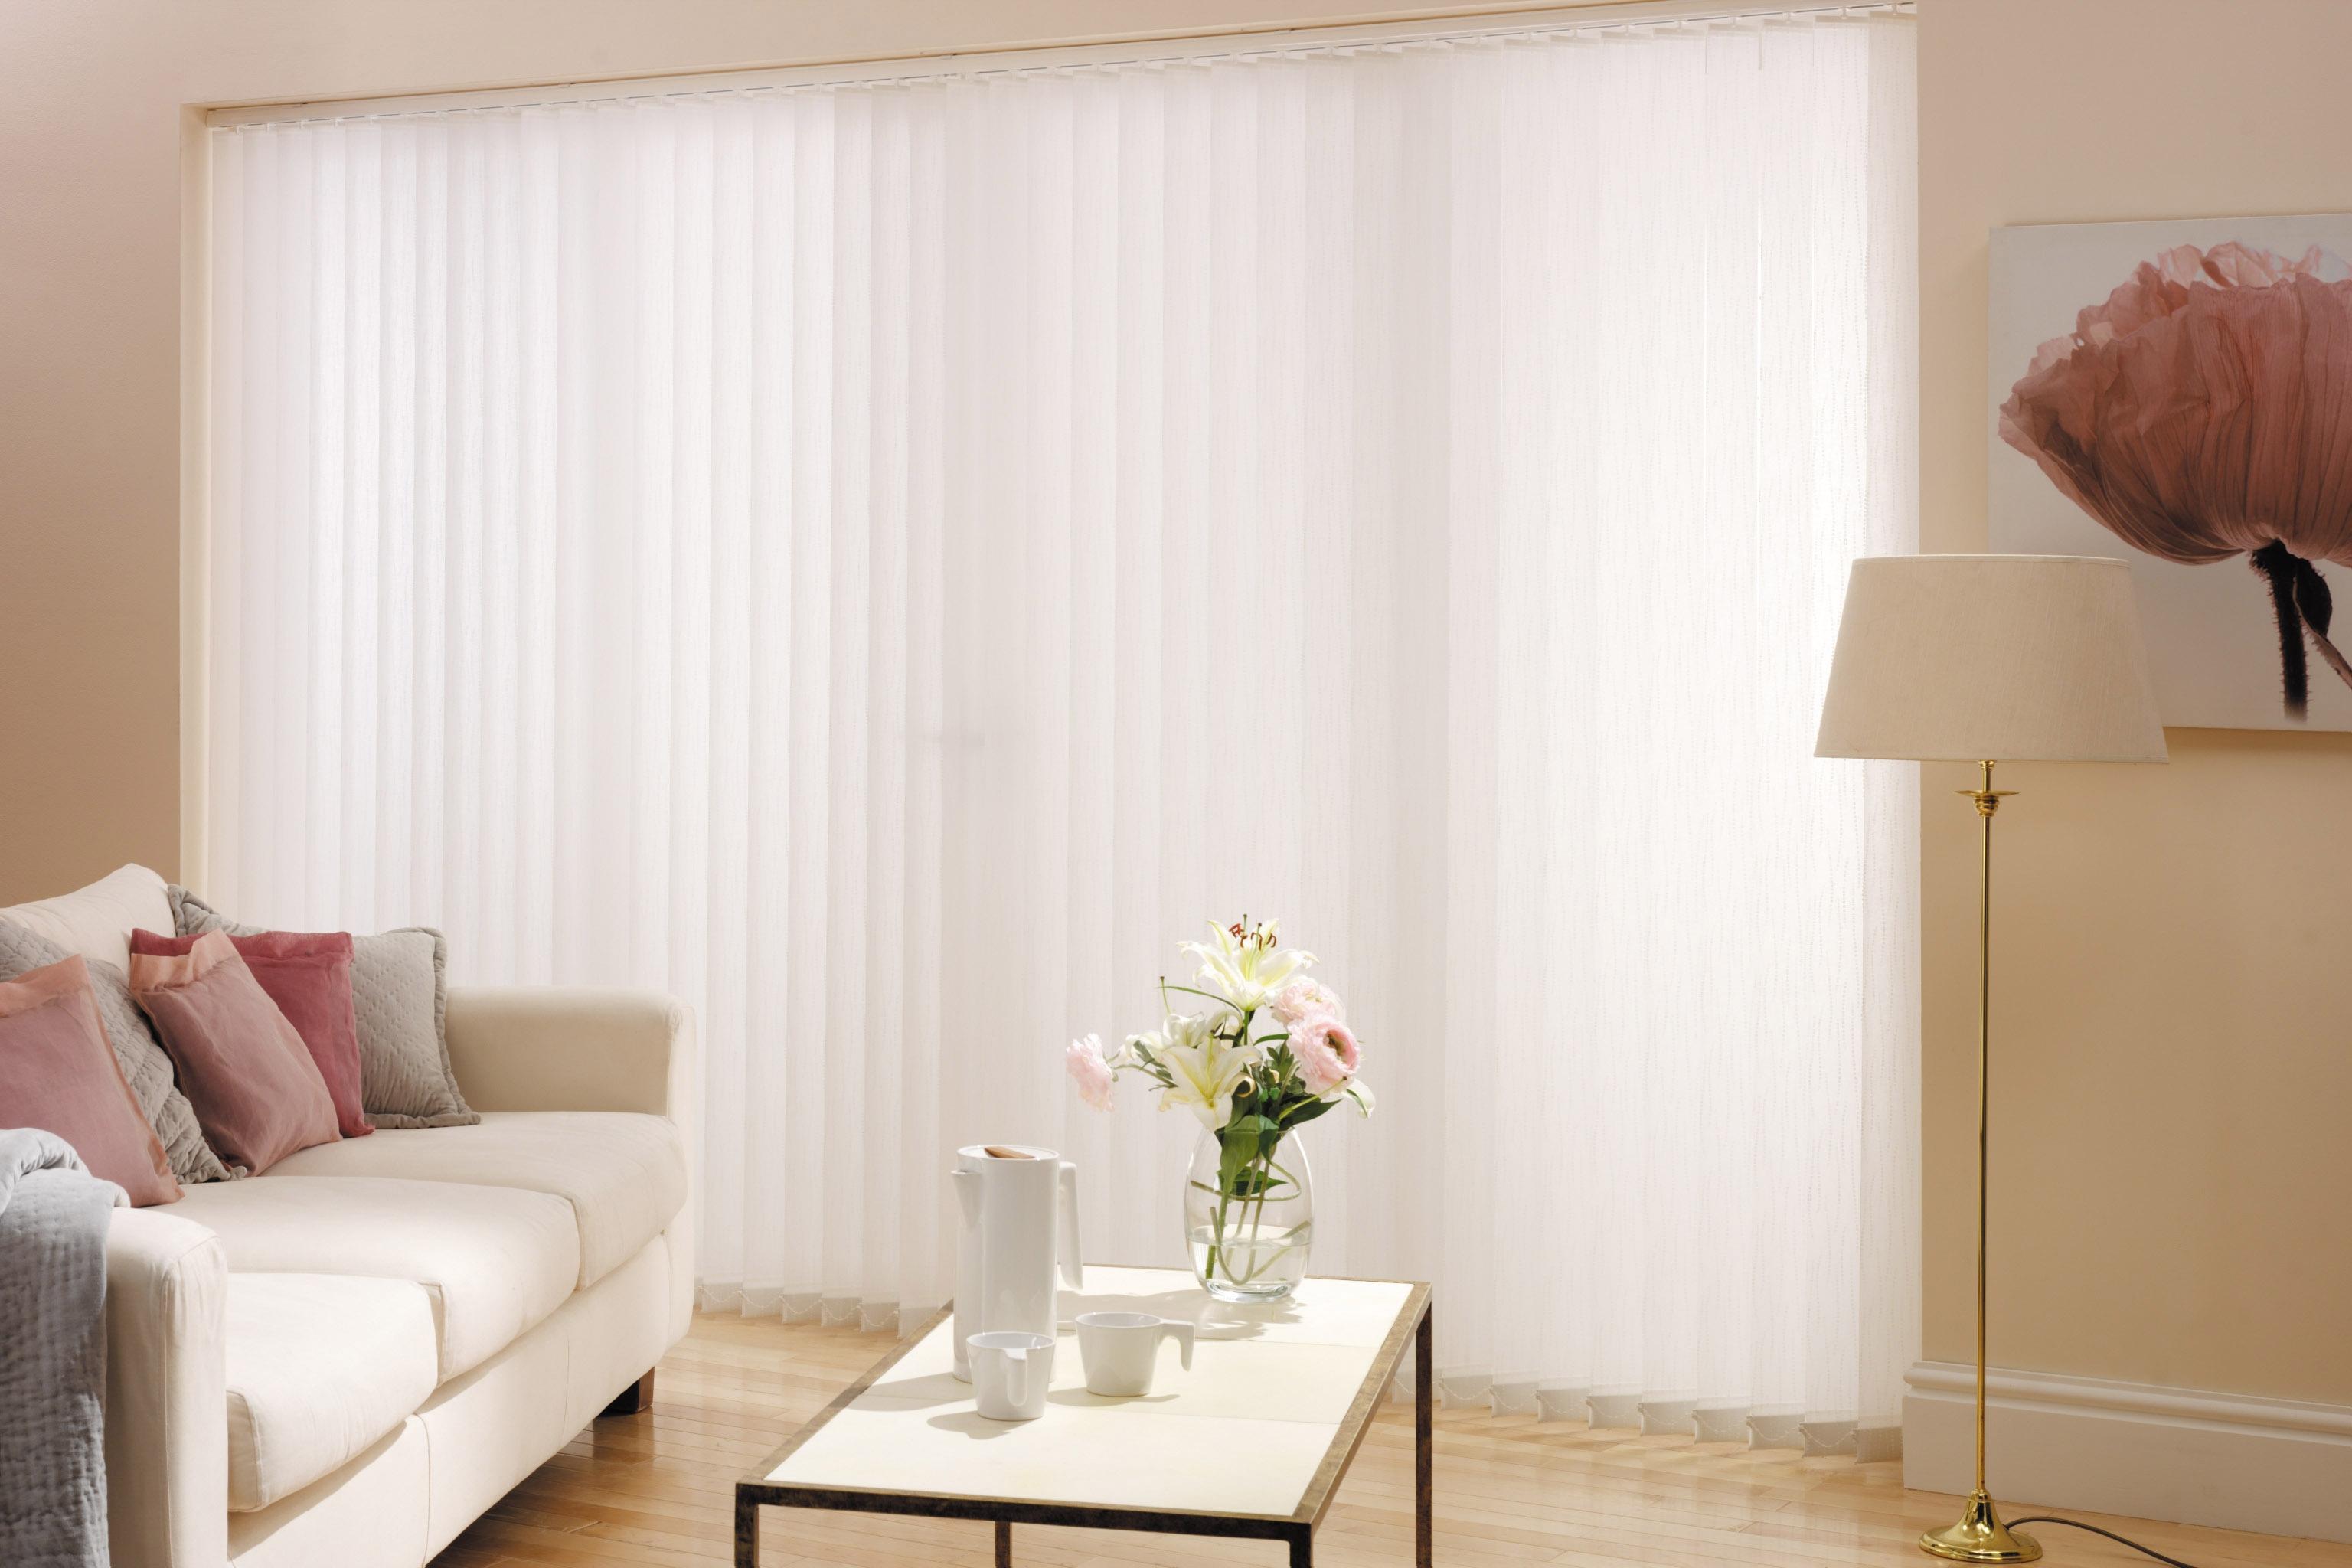 Ba Nursery Decorative Window Blinds Or Shade Brown Velvet Kids With Regard To Velvet Blinds (View 6 of 15)